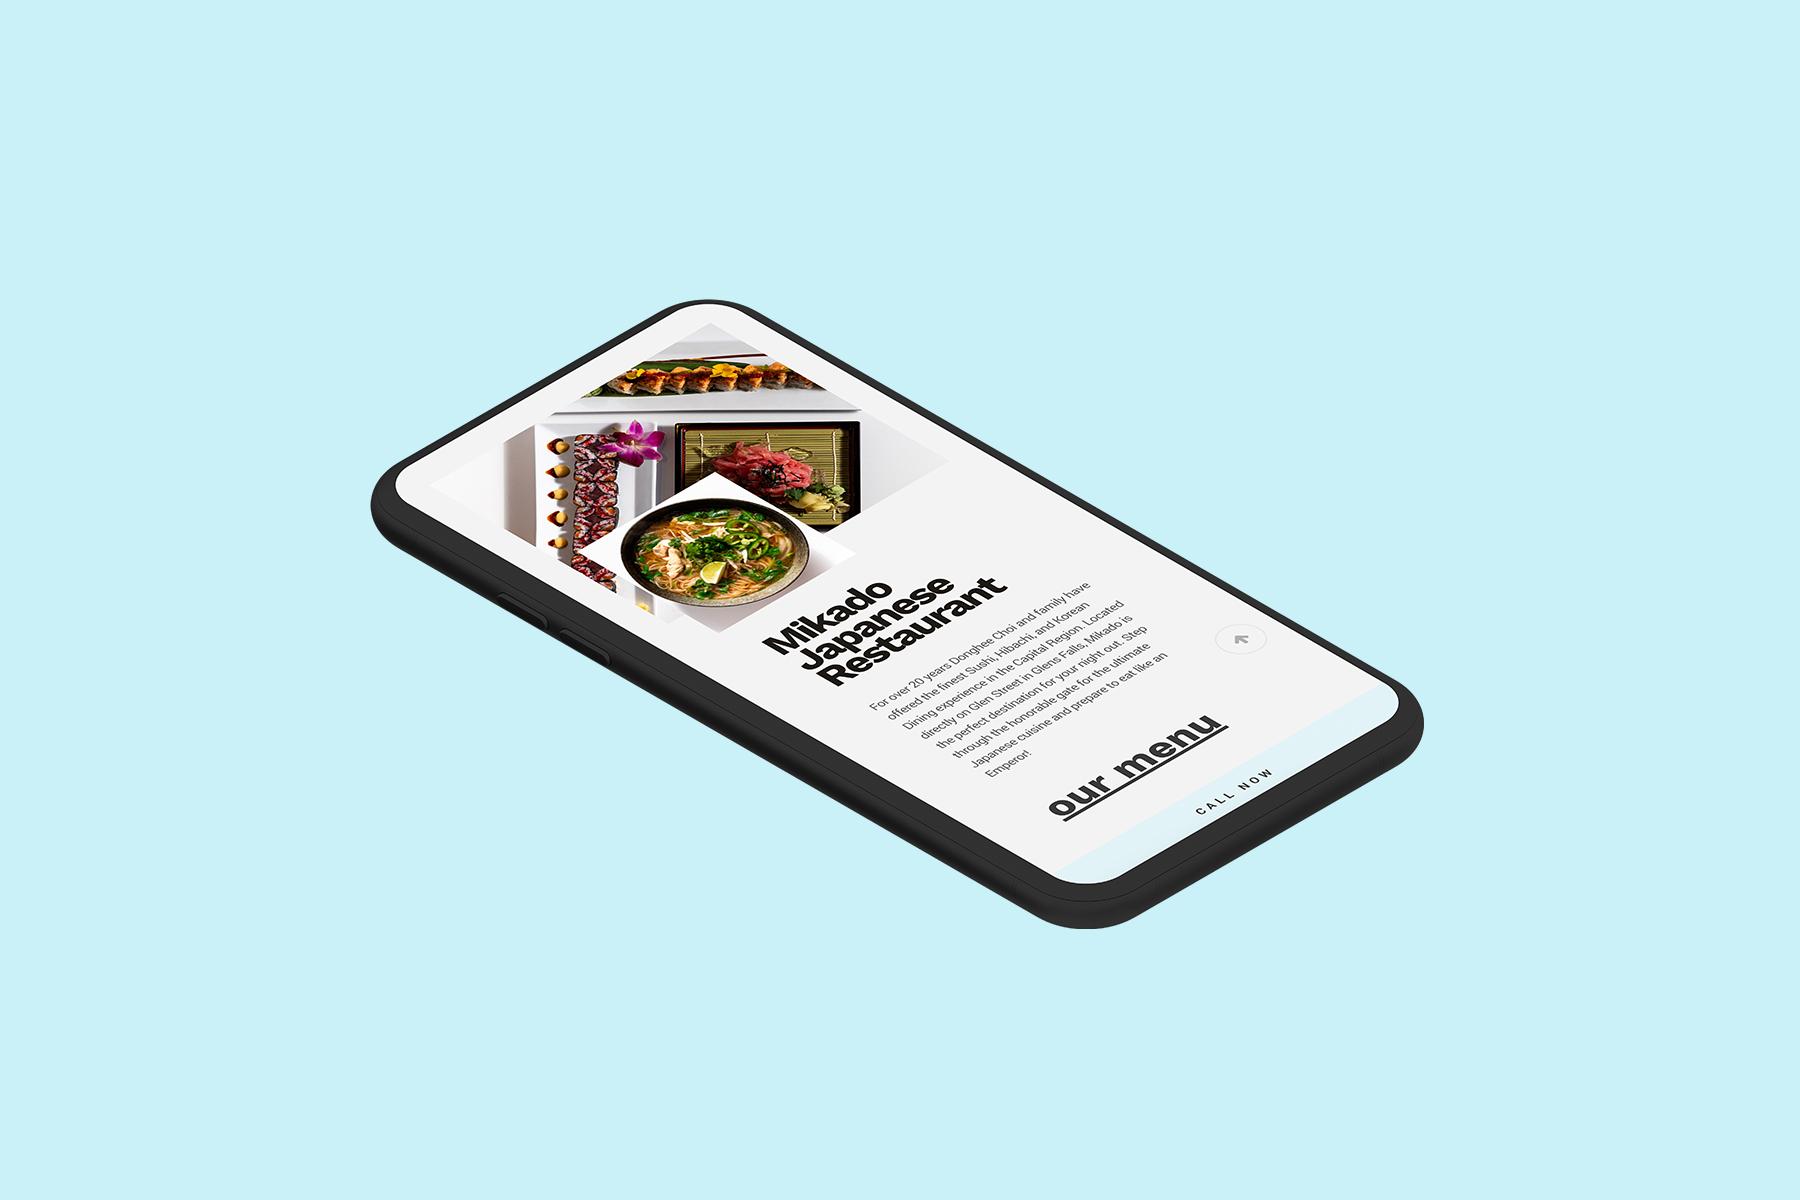 Web Dev of website on iPhone